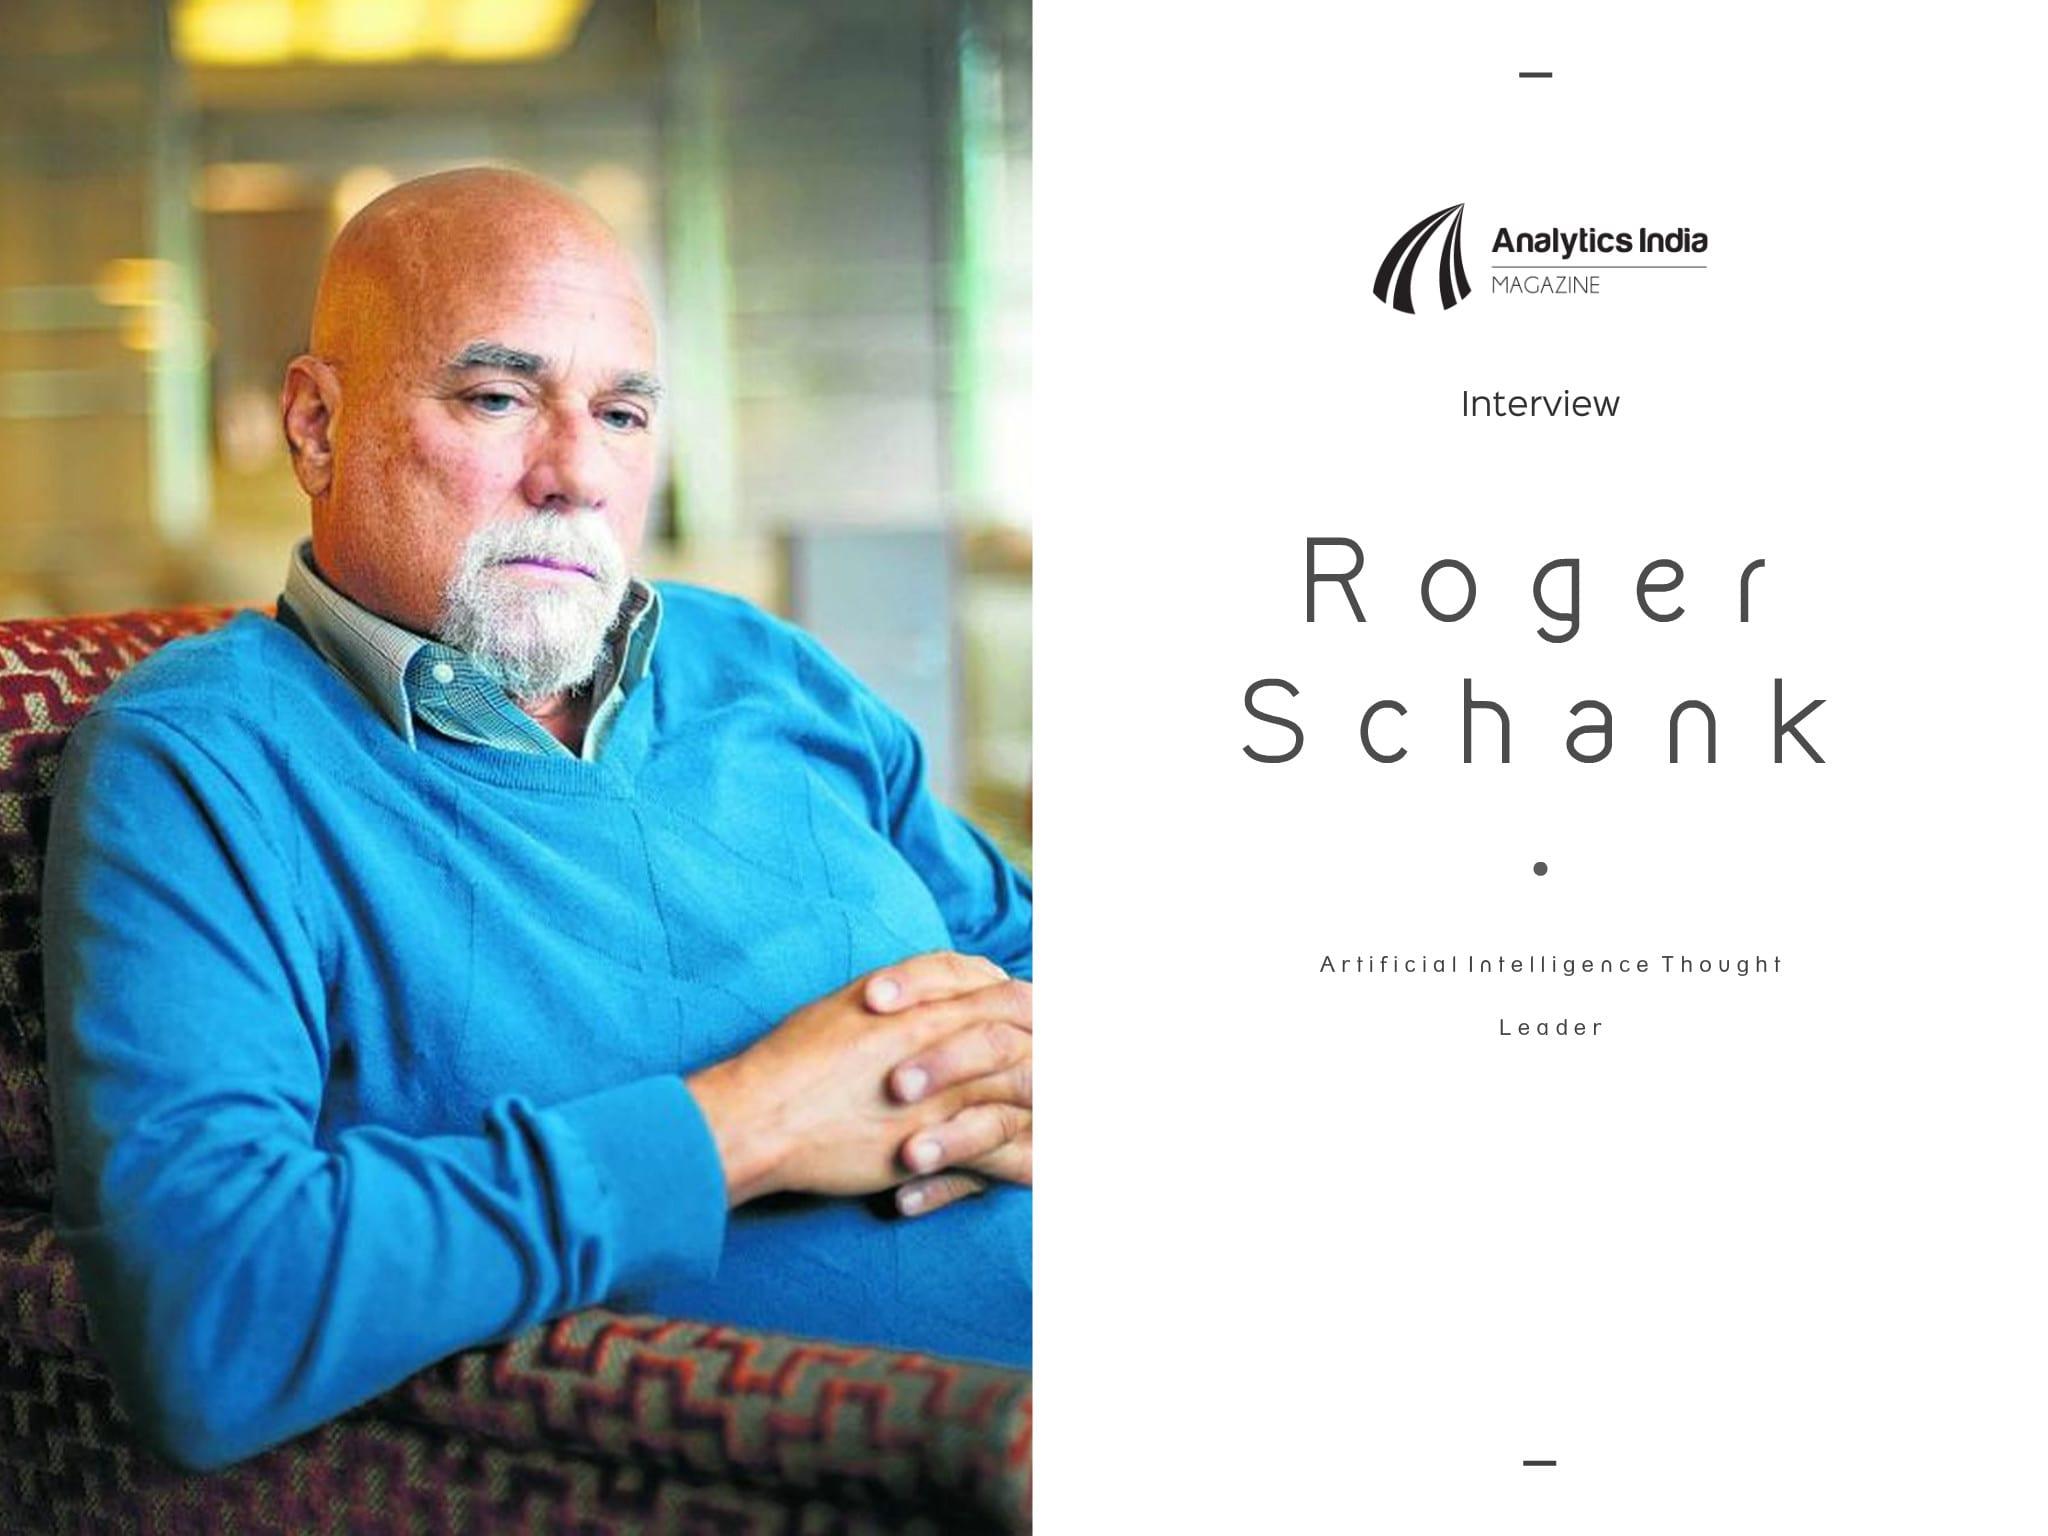 Roger Schank